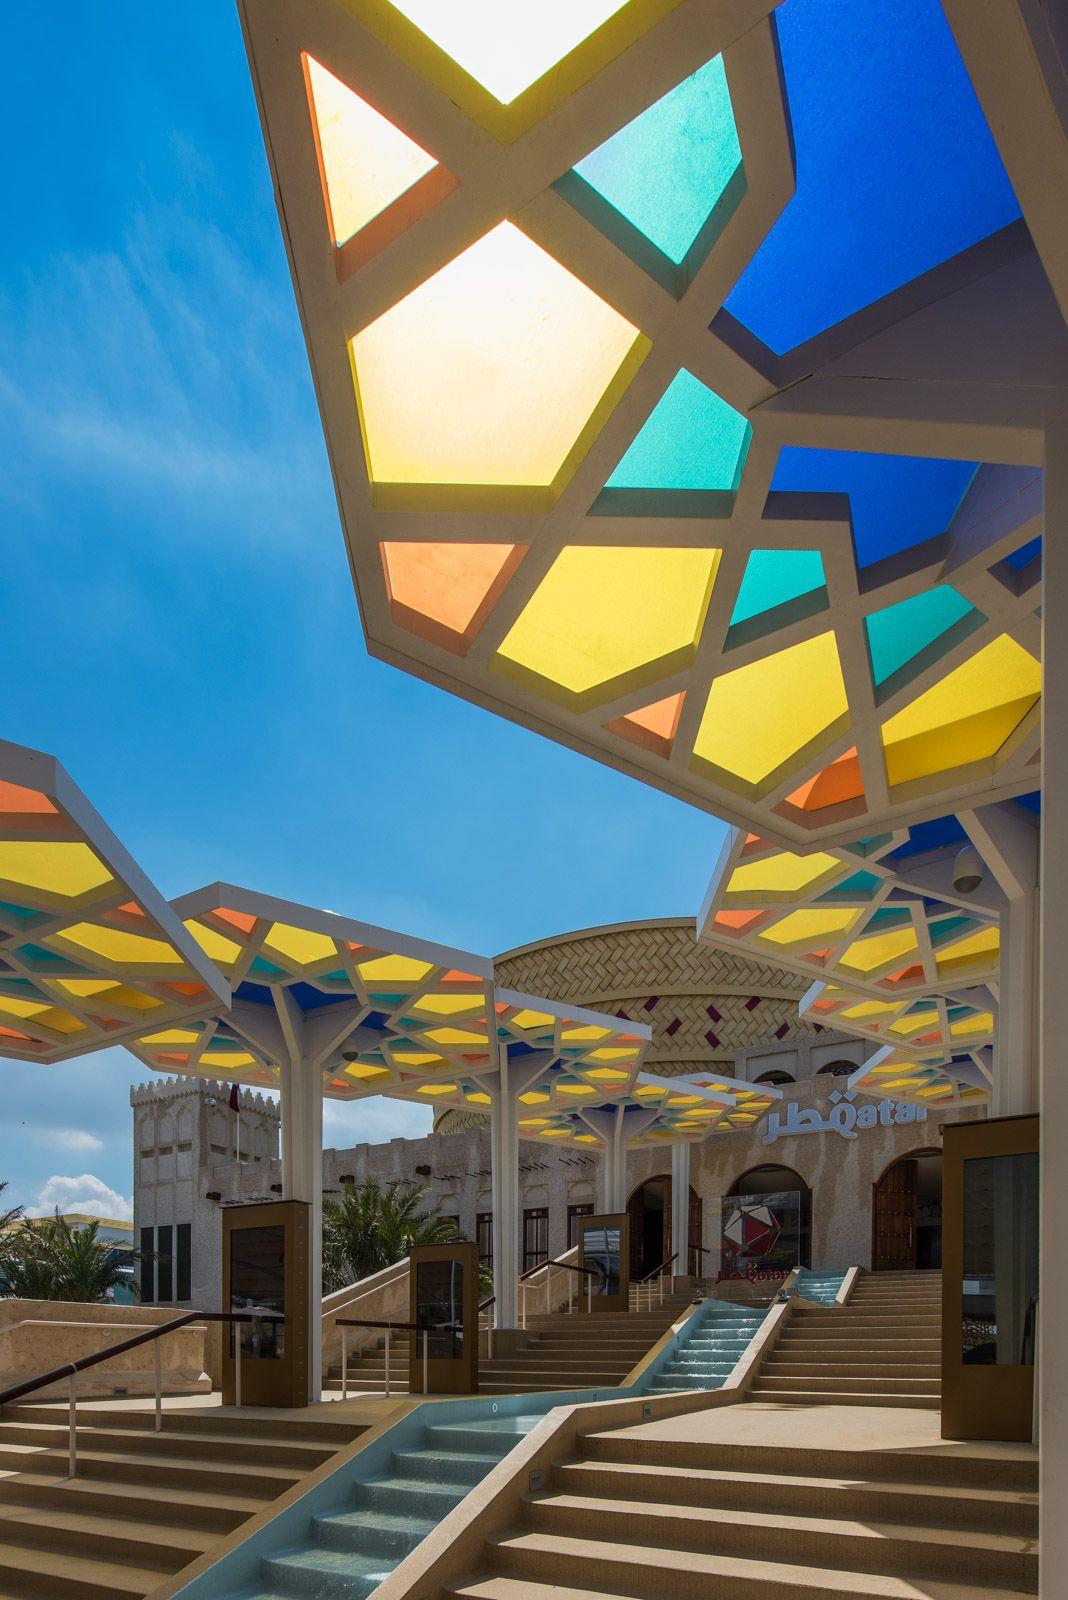 World expo 2015 milan pavilion qatar expo 2015 for Expo arredo